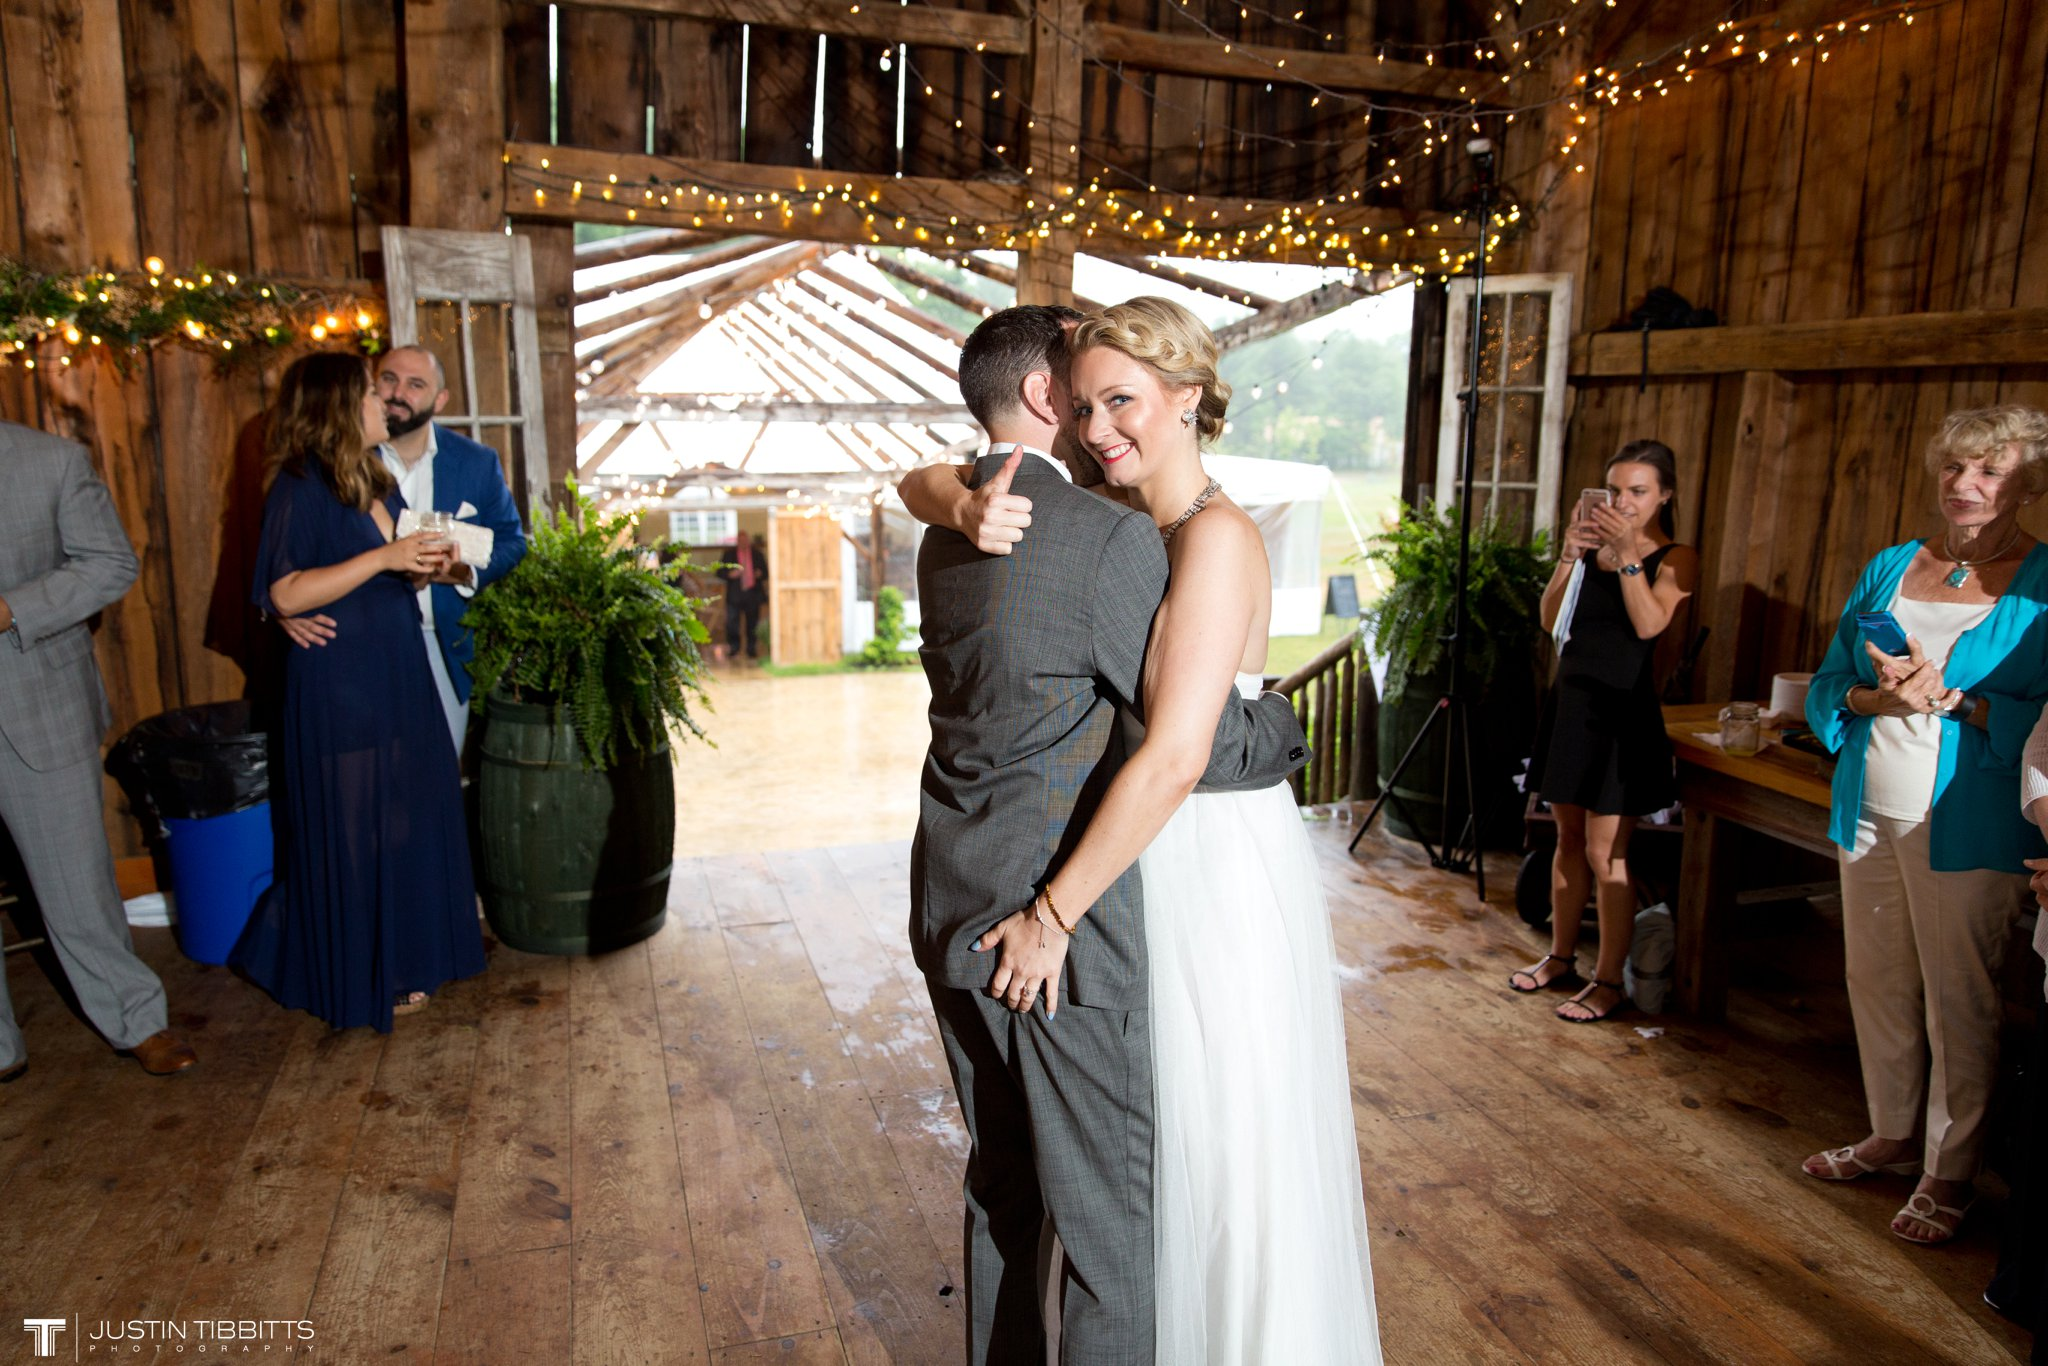 burlap-and-beams-wedding-photos-with-joran-and-molly_0102